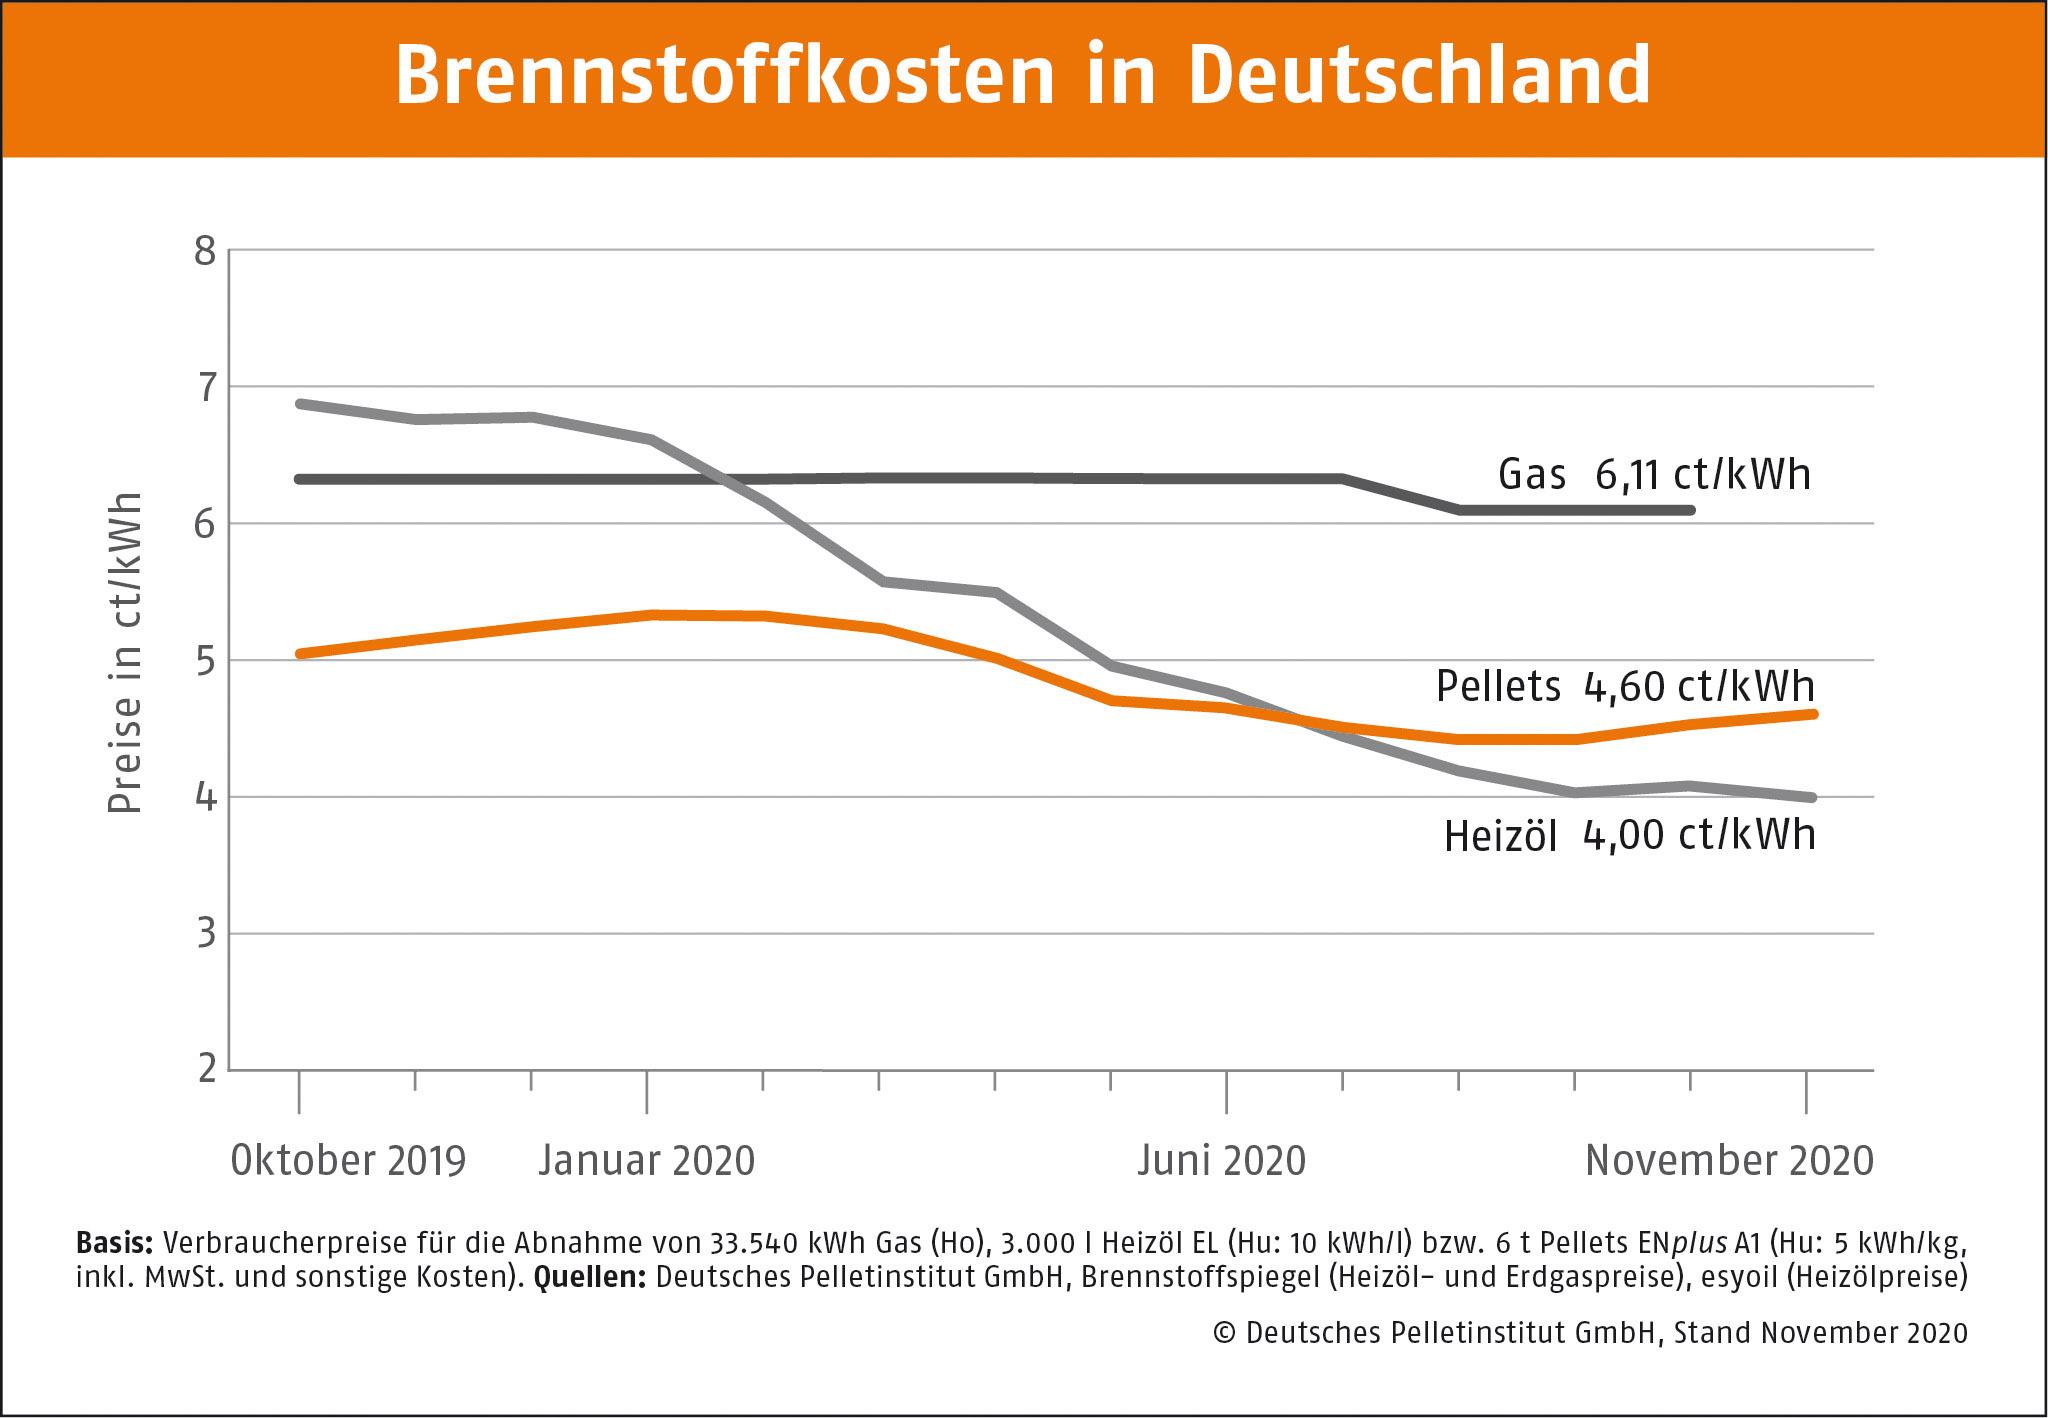 DEPI Brennstoffkosten in Deutschland DEPI Brennstoffkosten November 2020